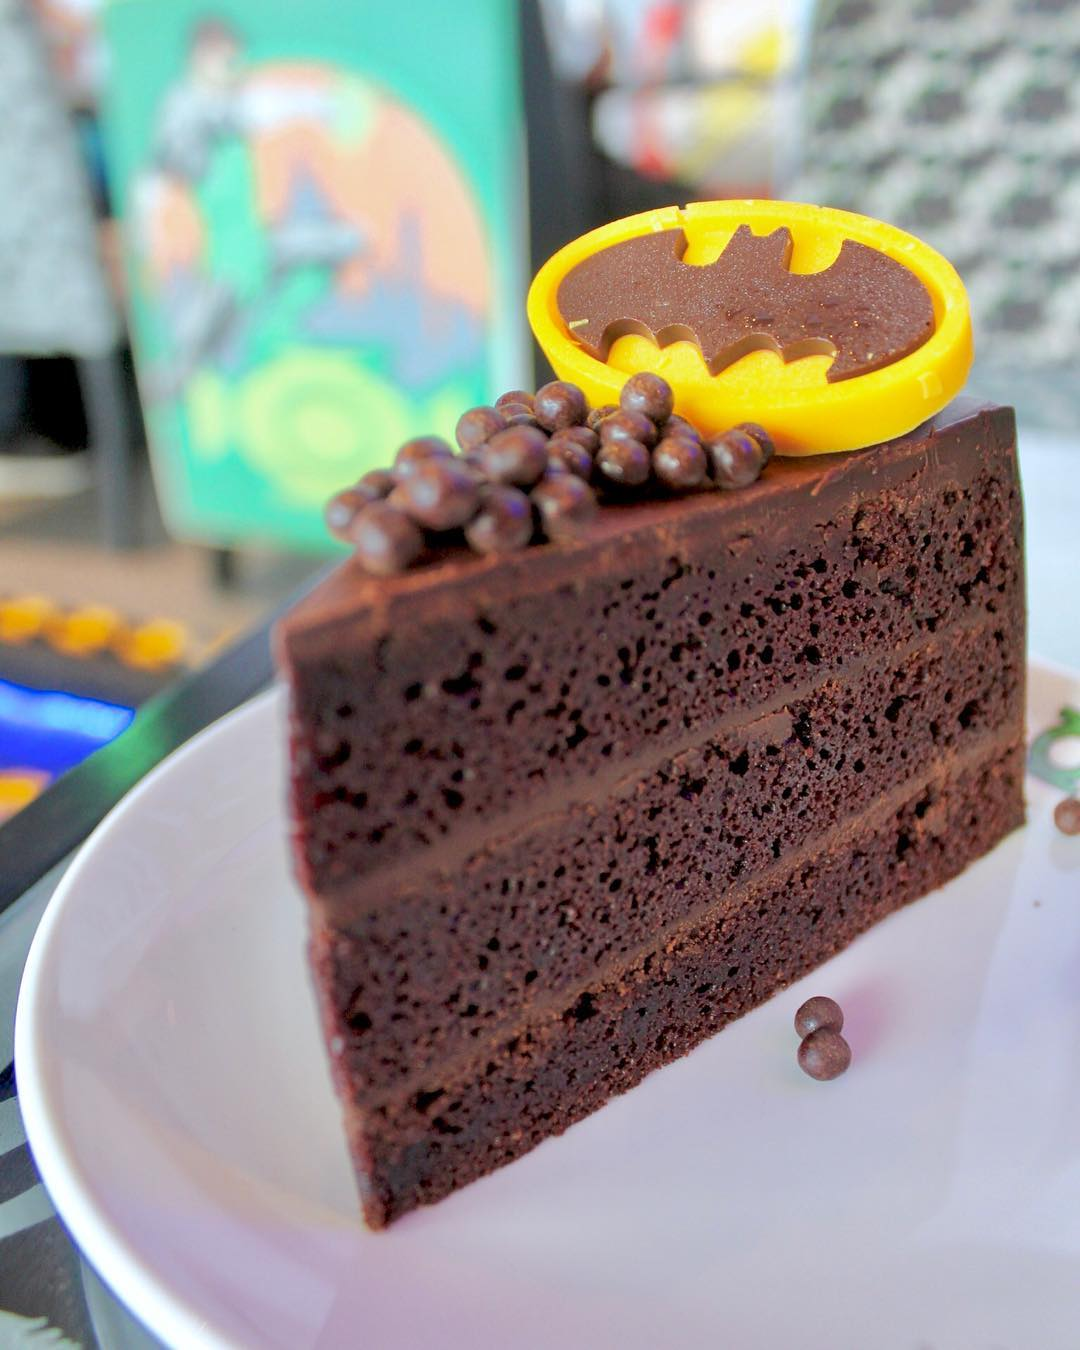 Batman Chocolate Fudge Cake ($9.90)